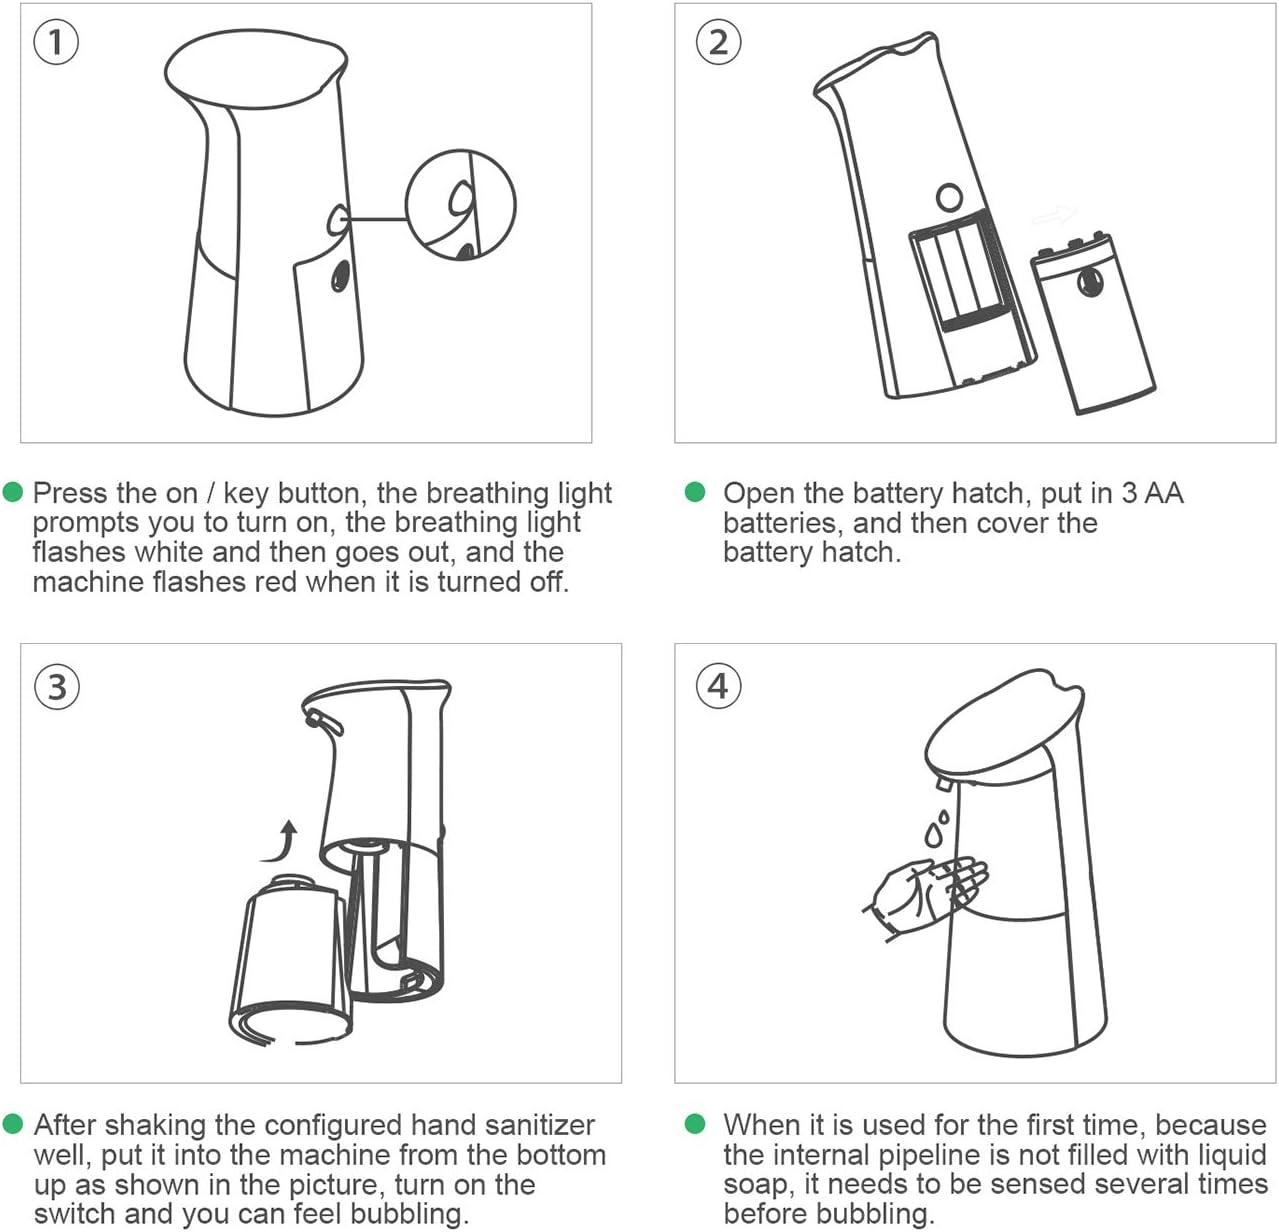 Foaming Soap Dispenser Automatic Soap Dispenser Hand soap Dispenser Touchless Soap Dispenser 300ML for Bathroom Kitchen